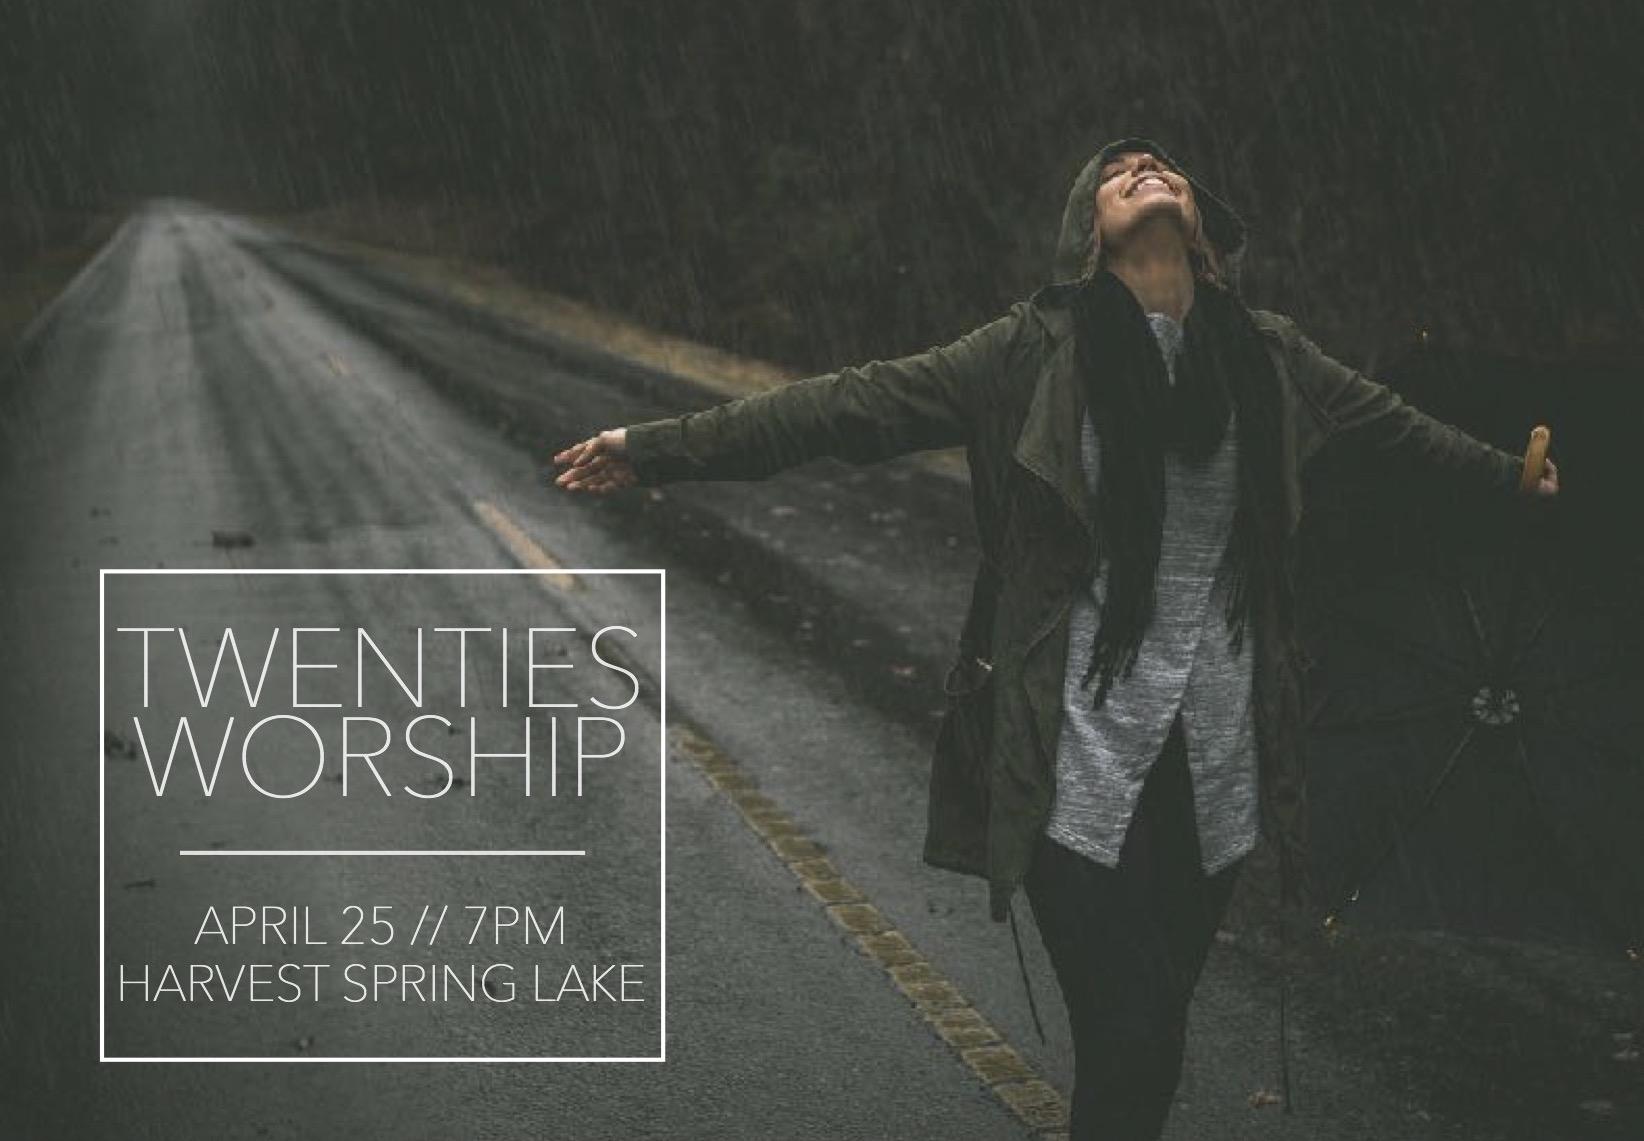 Twenties Worship Poster FINAL FINAL.jpg